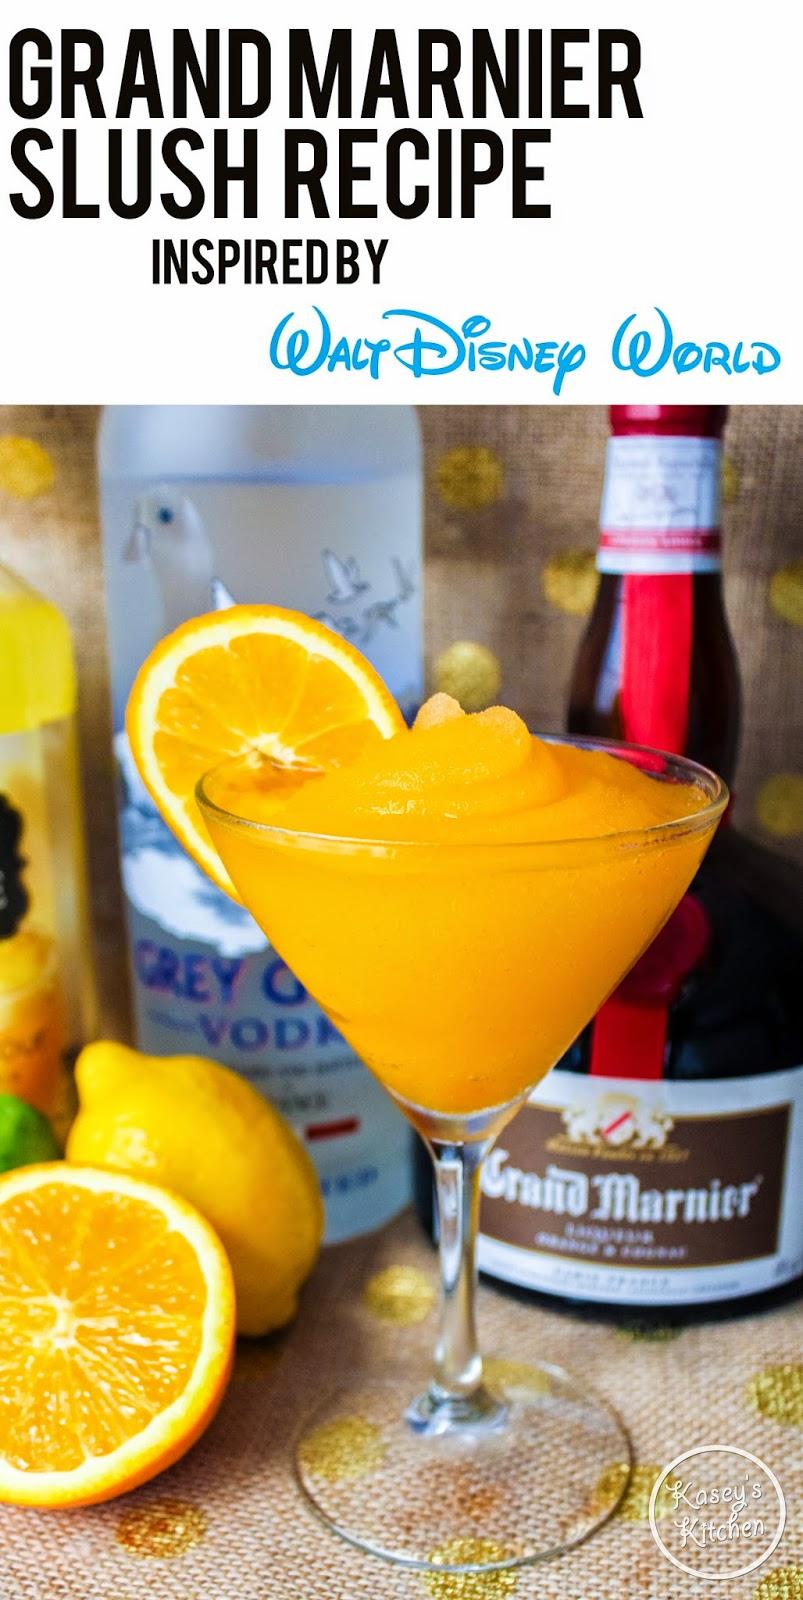 WDW Orange Grand Marnier Slush